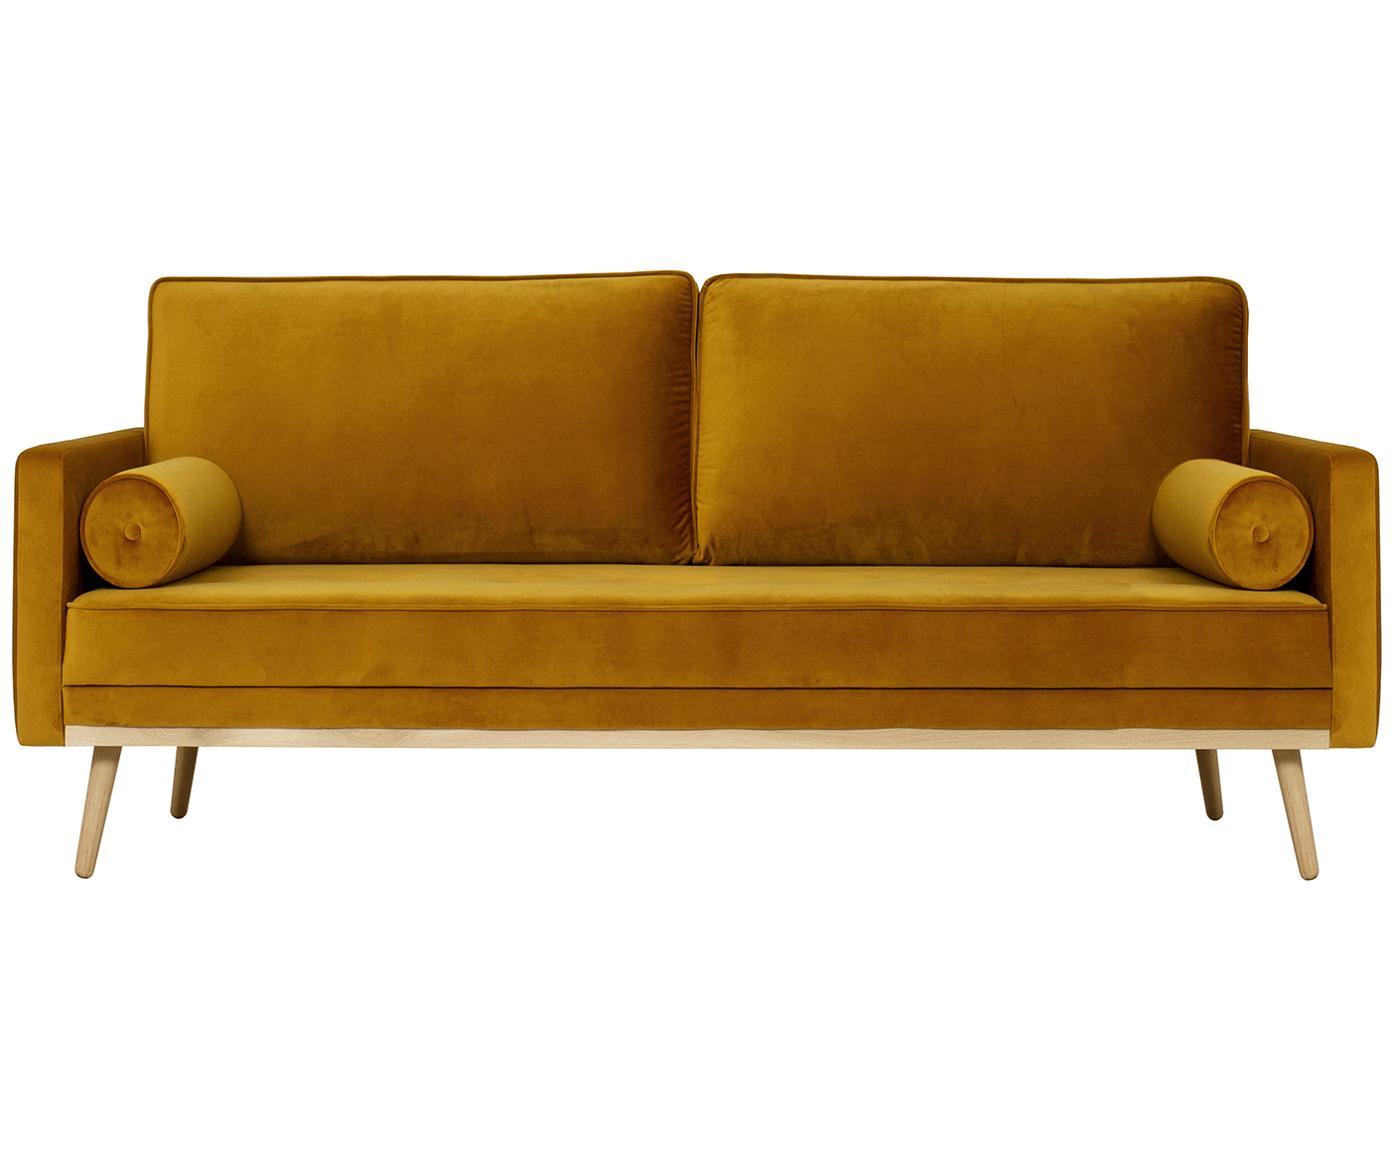 Samt-Sofa Saint (3-Sitzer), Bezug: Samt (Polyester) 35.000 S, Gestell: Massives Eichenholz, Span, Samt Senfgelb, B 210 x T 93 cm